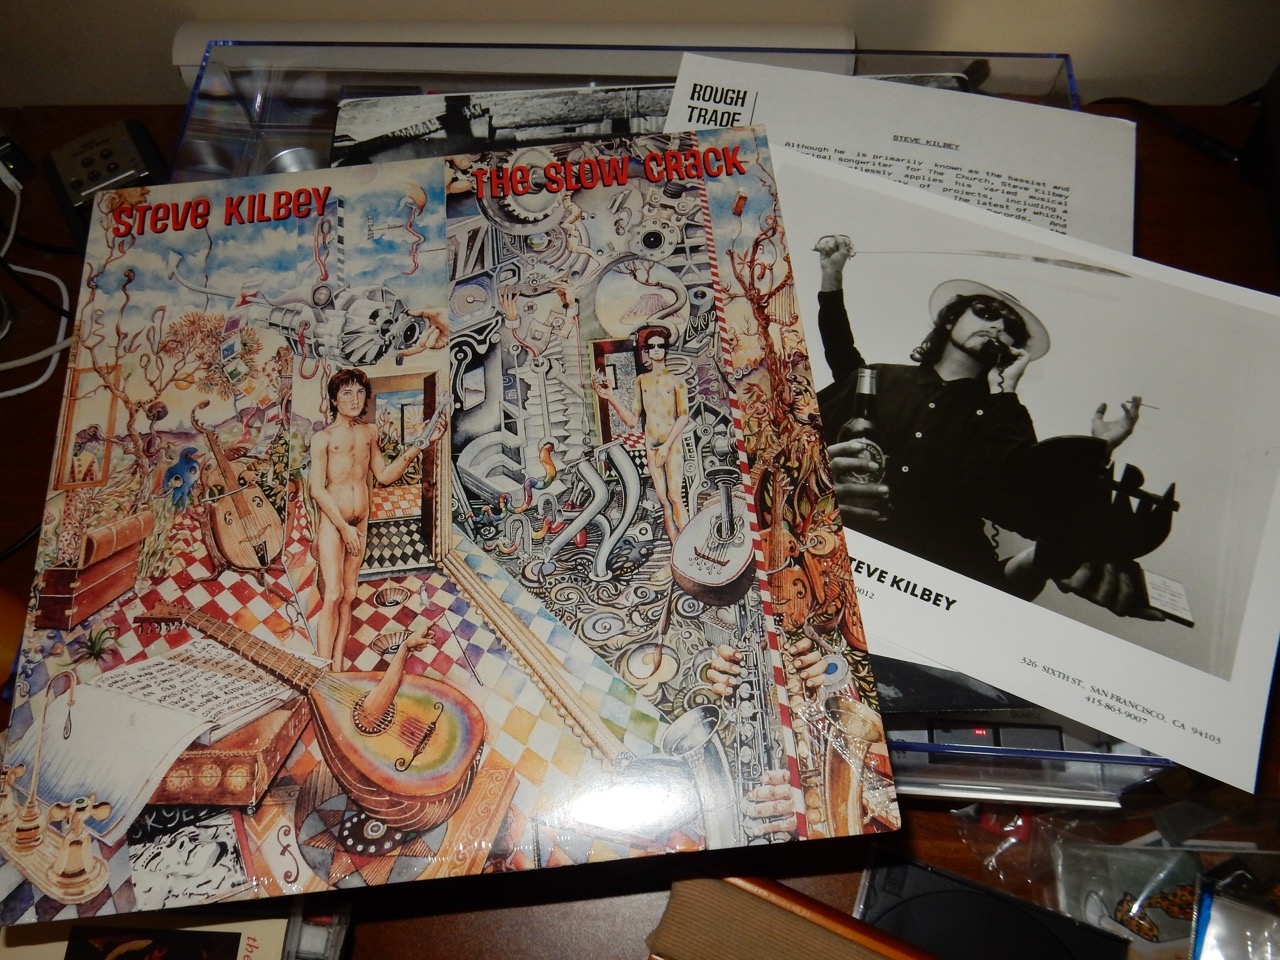 Steve Kilbey Vinyl